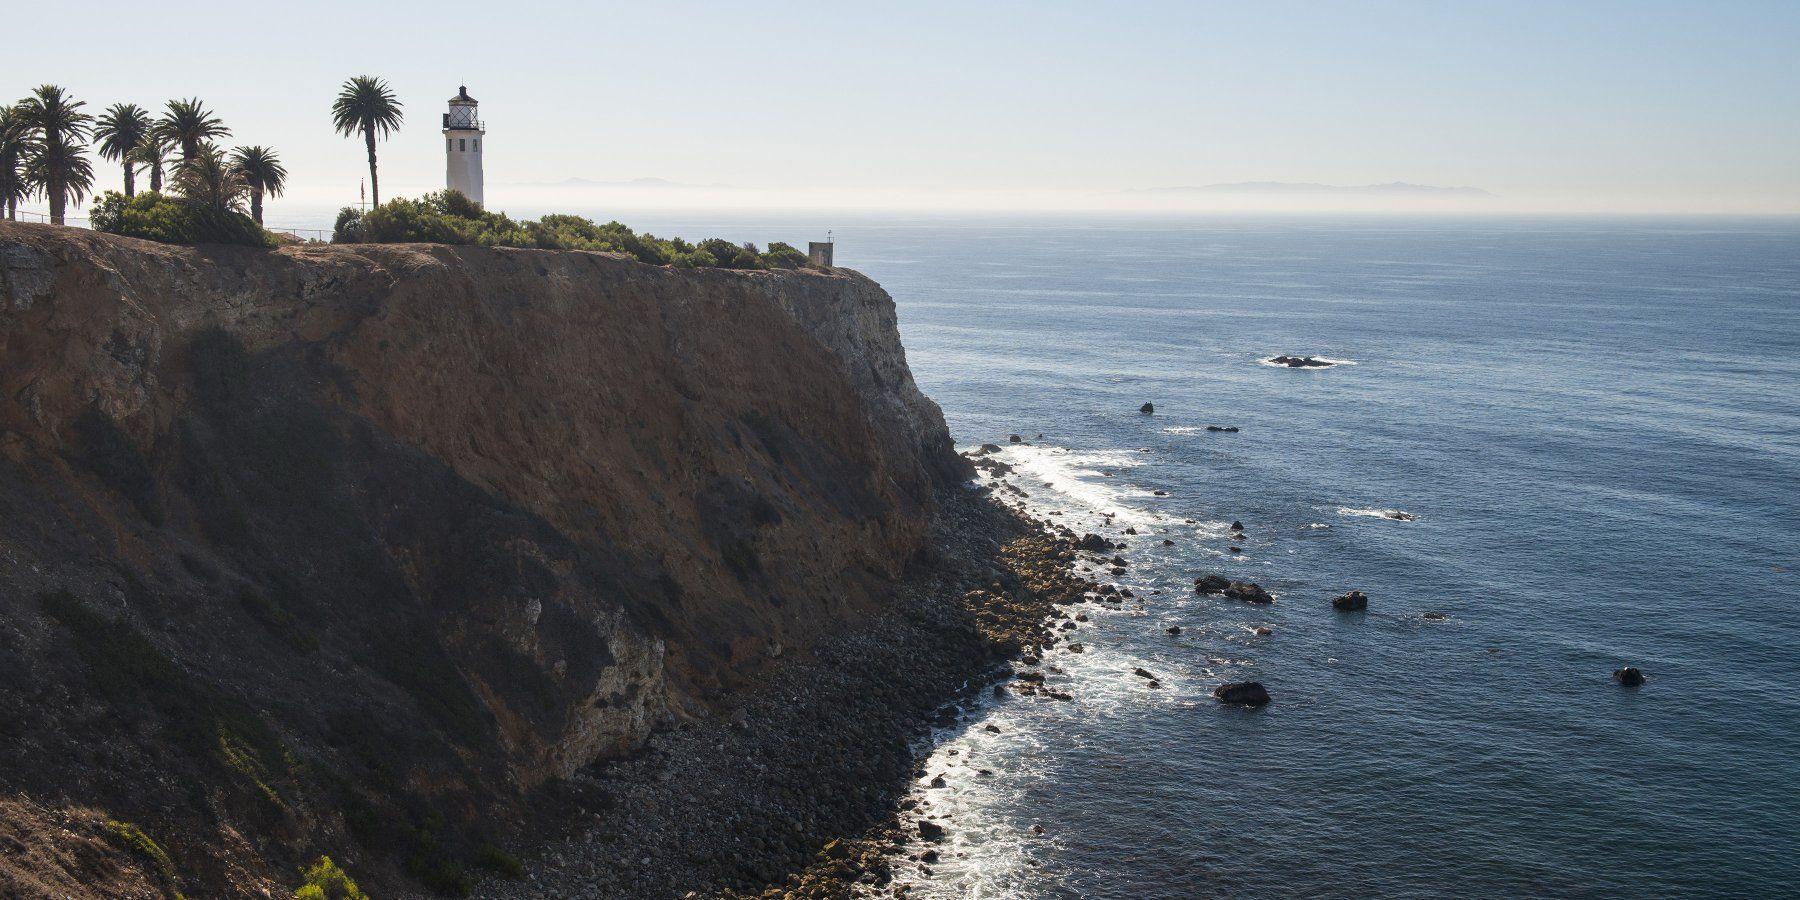 Point Vicente Lighthouse Park With Santa Catalina Island In The Distance Point Vicente Lighthouse Park Santa Catalina Island Catalina Island Park